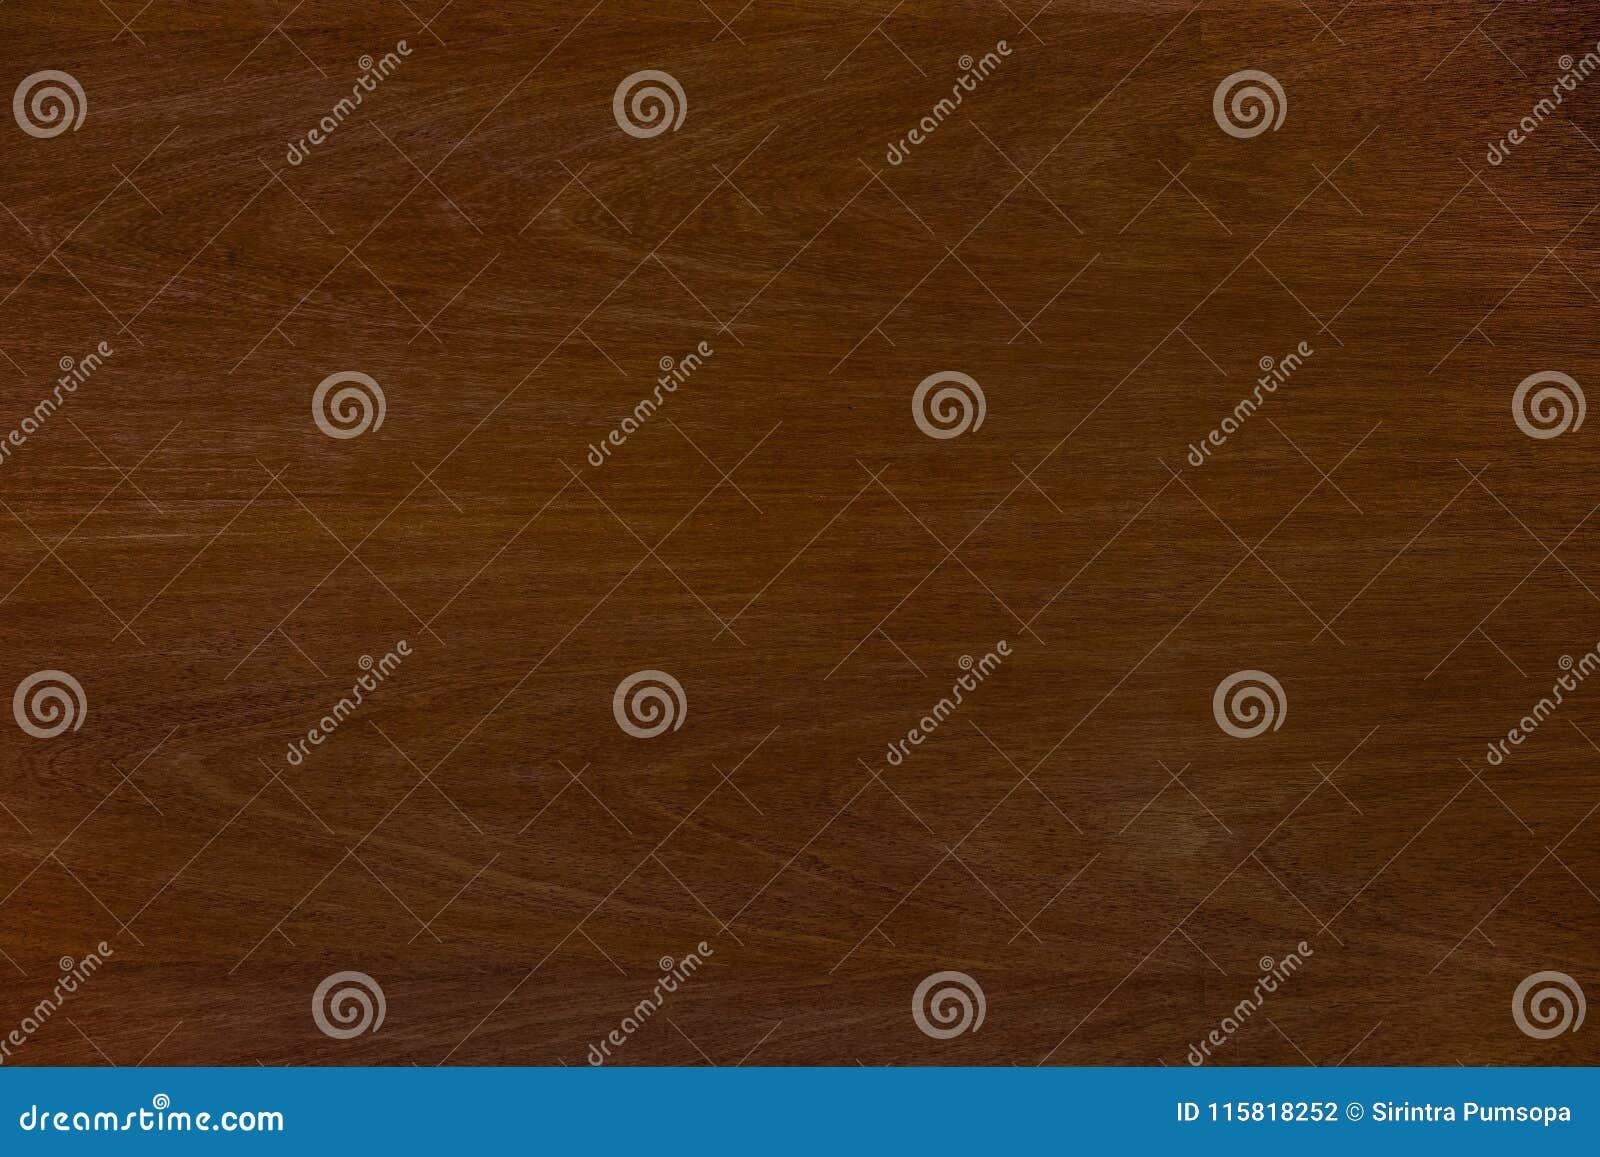 Download Dark Teak Wood Brown Grain Texture Background. Nature Grunge Pat  Stock Photo   Image